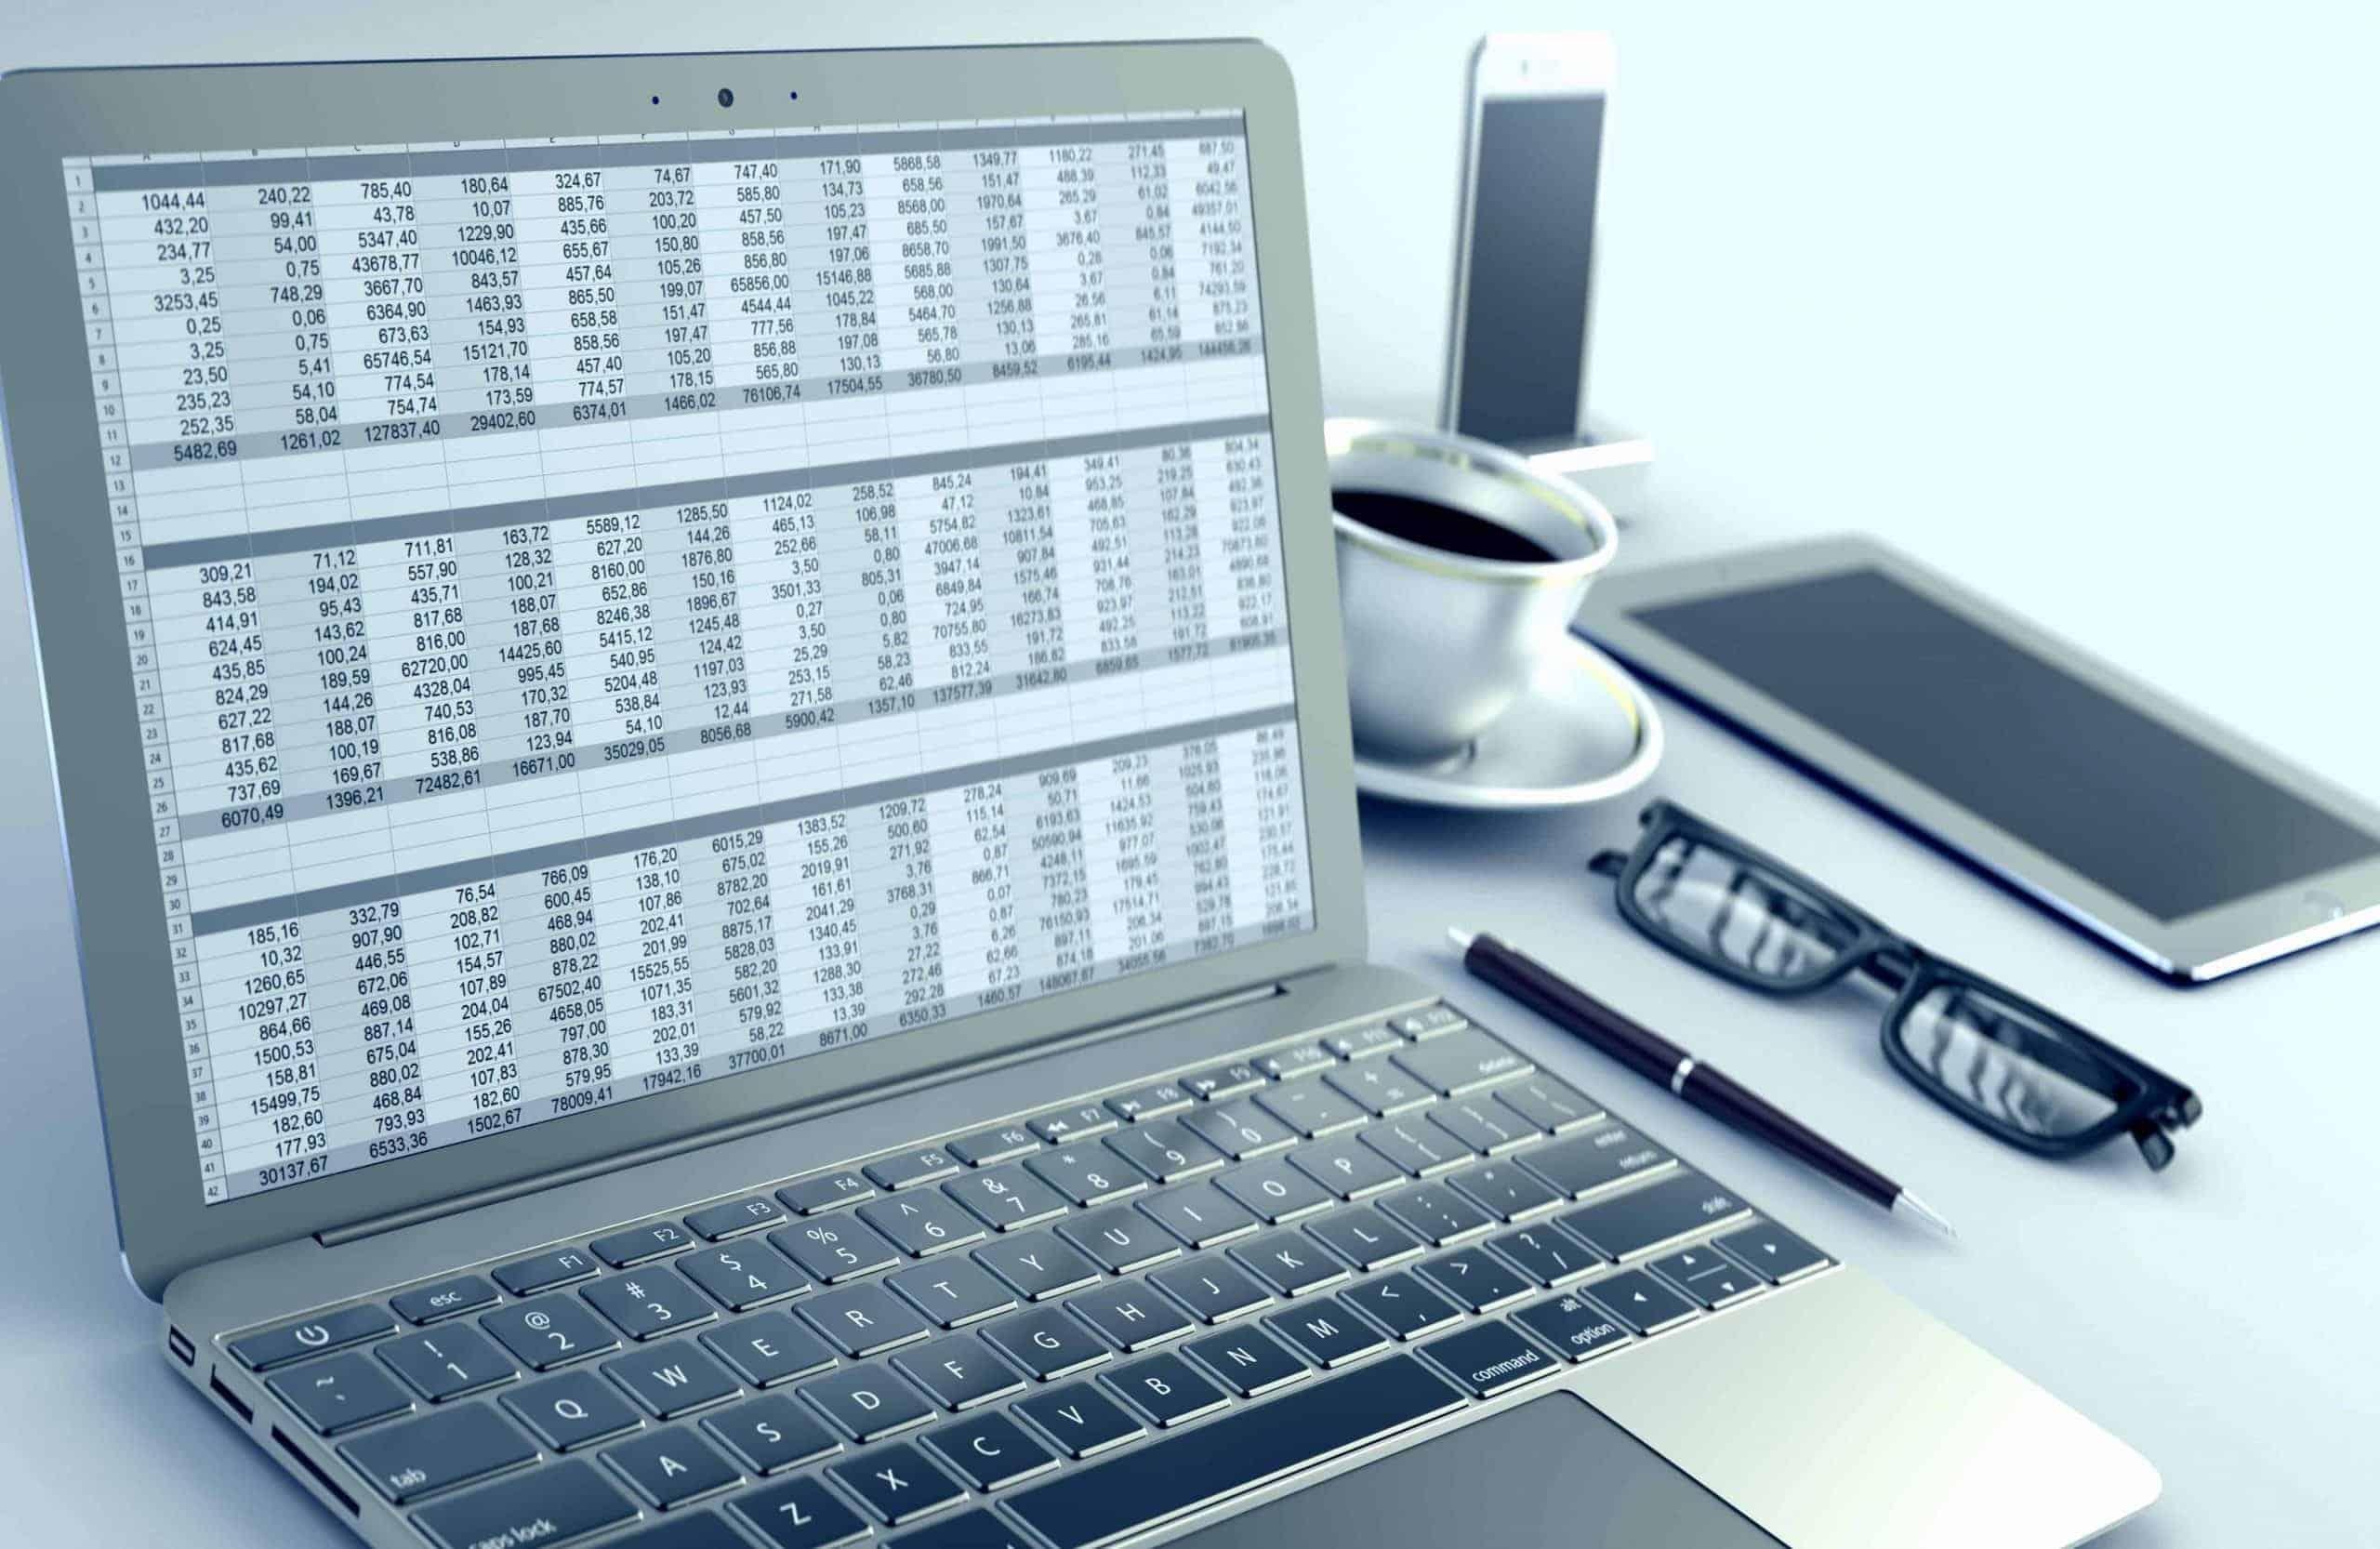 Spreadsheet in Laptops